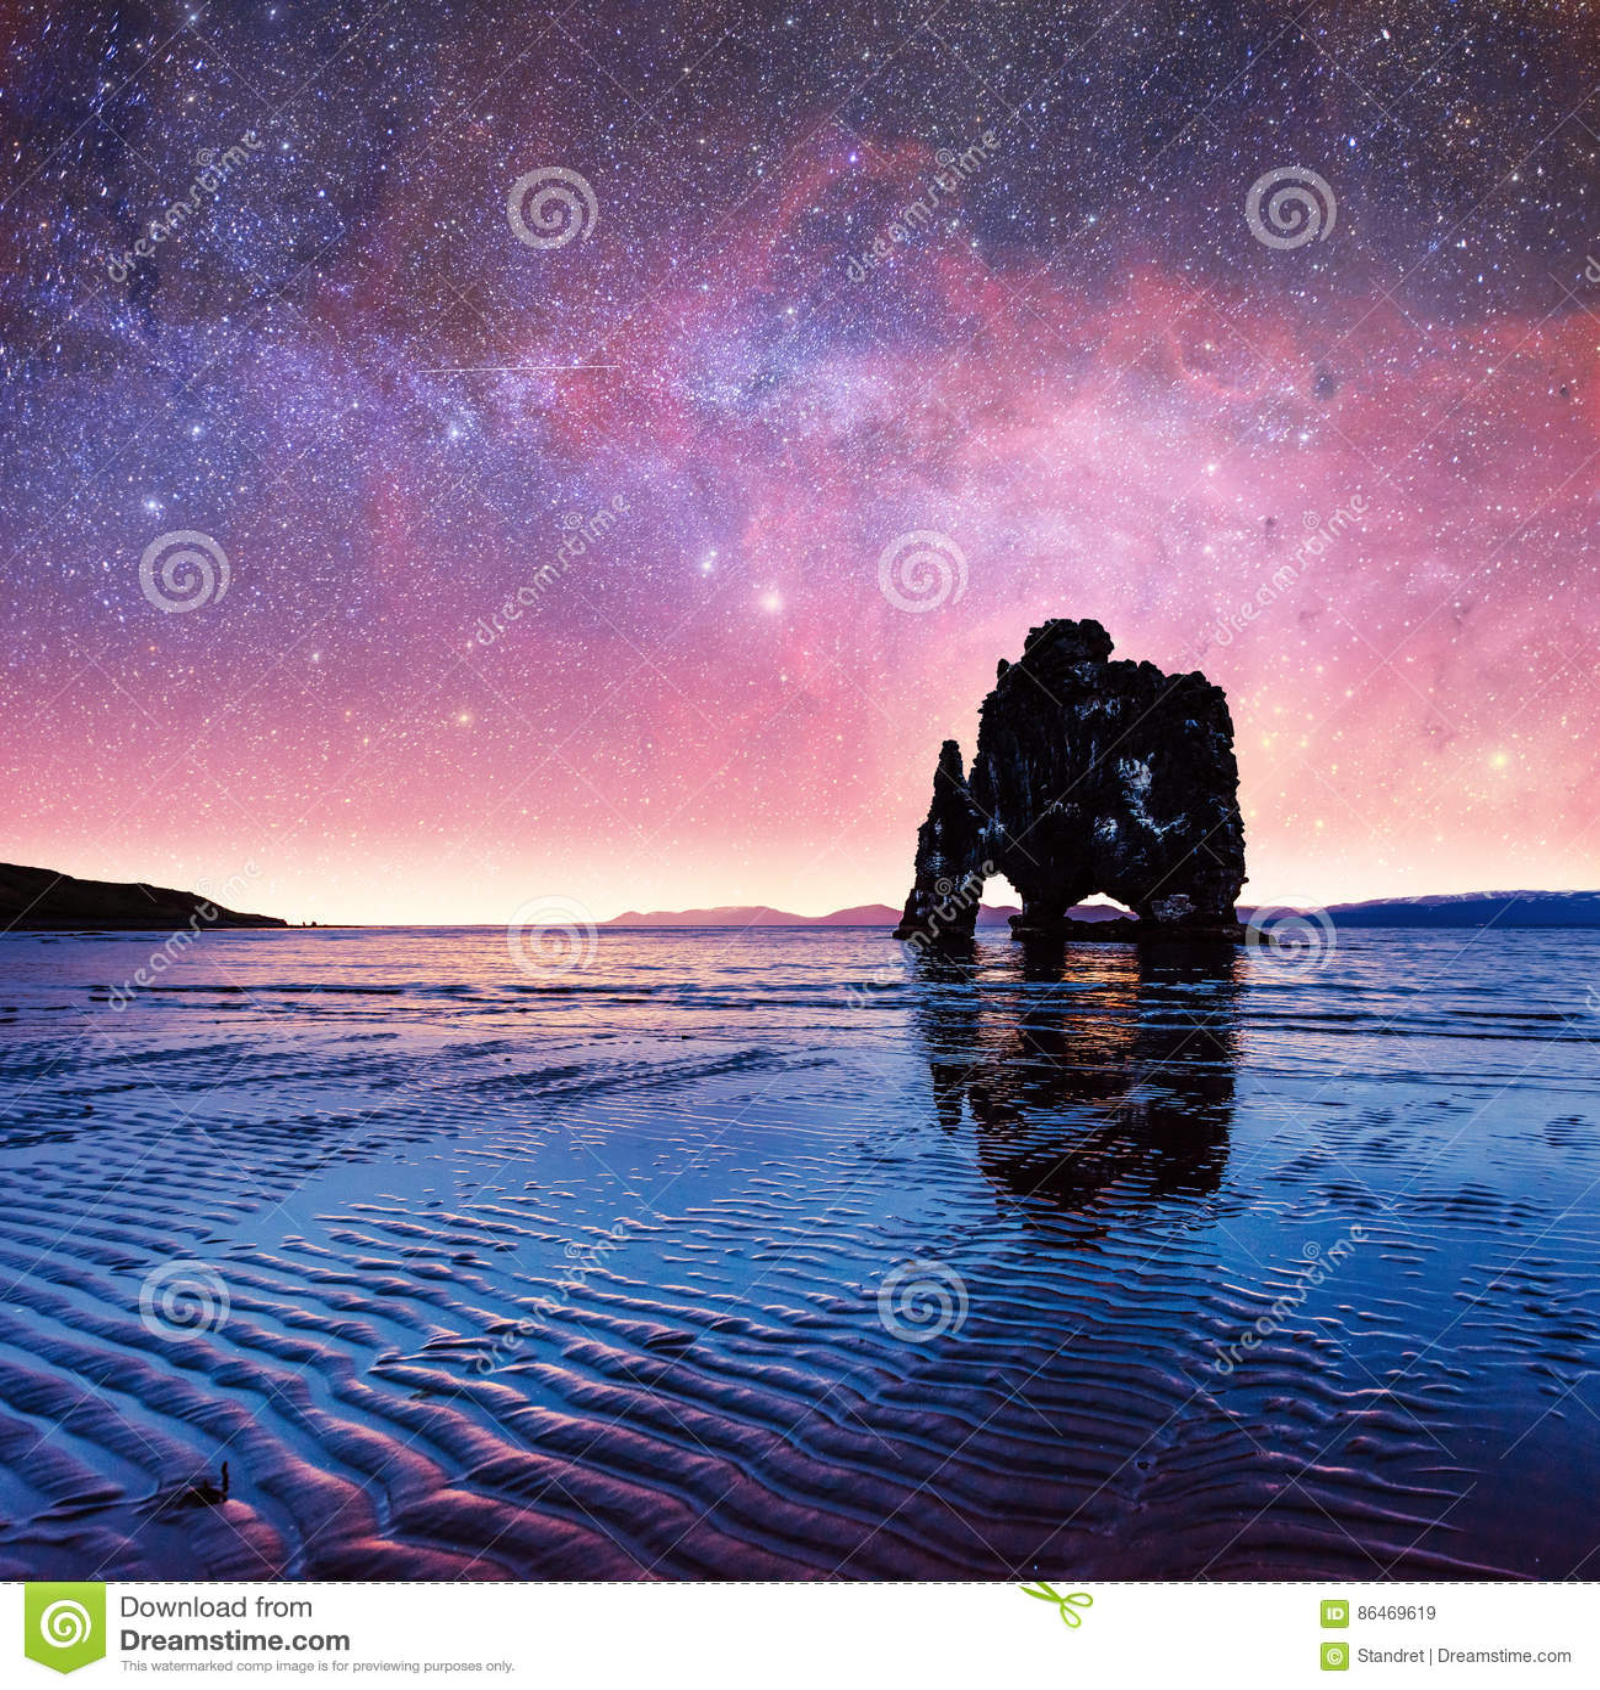 Hvitserkur 15 ύψος μ Φανταστικός έναστρος ουρανός και ο γαλακτώδης τρόπος ο